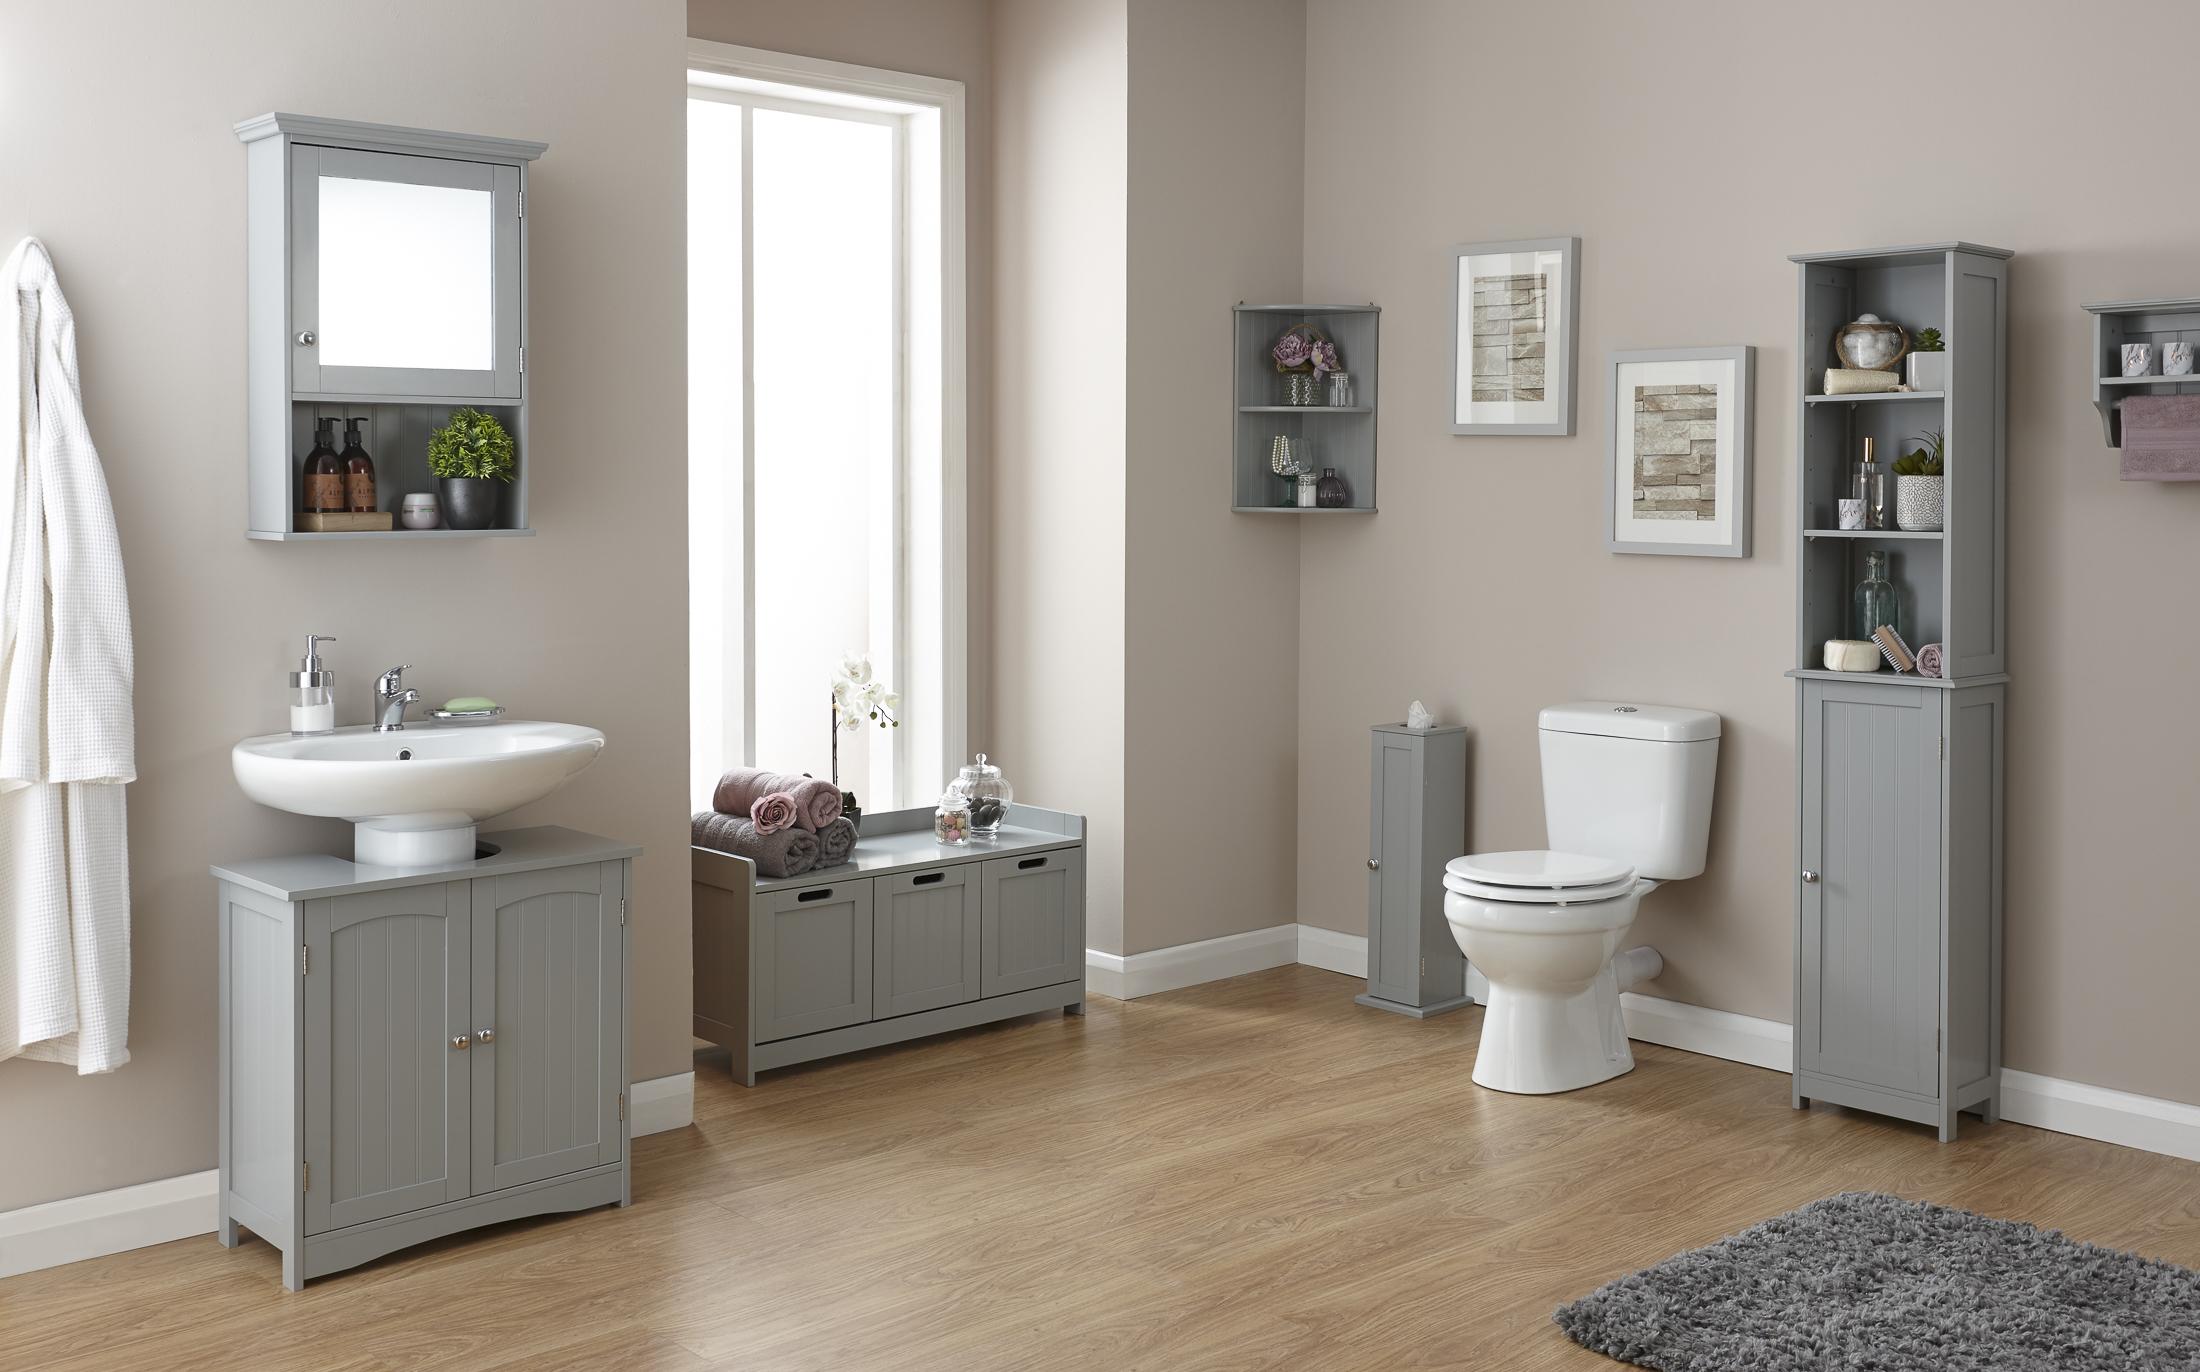 Grey Wood Bathroom Furniture Colonial Range Cupboards Storage  # Muebles Colineal Ecuador